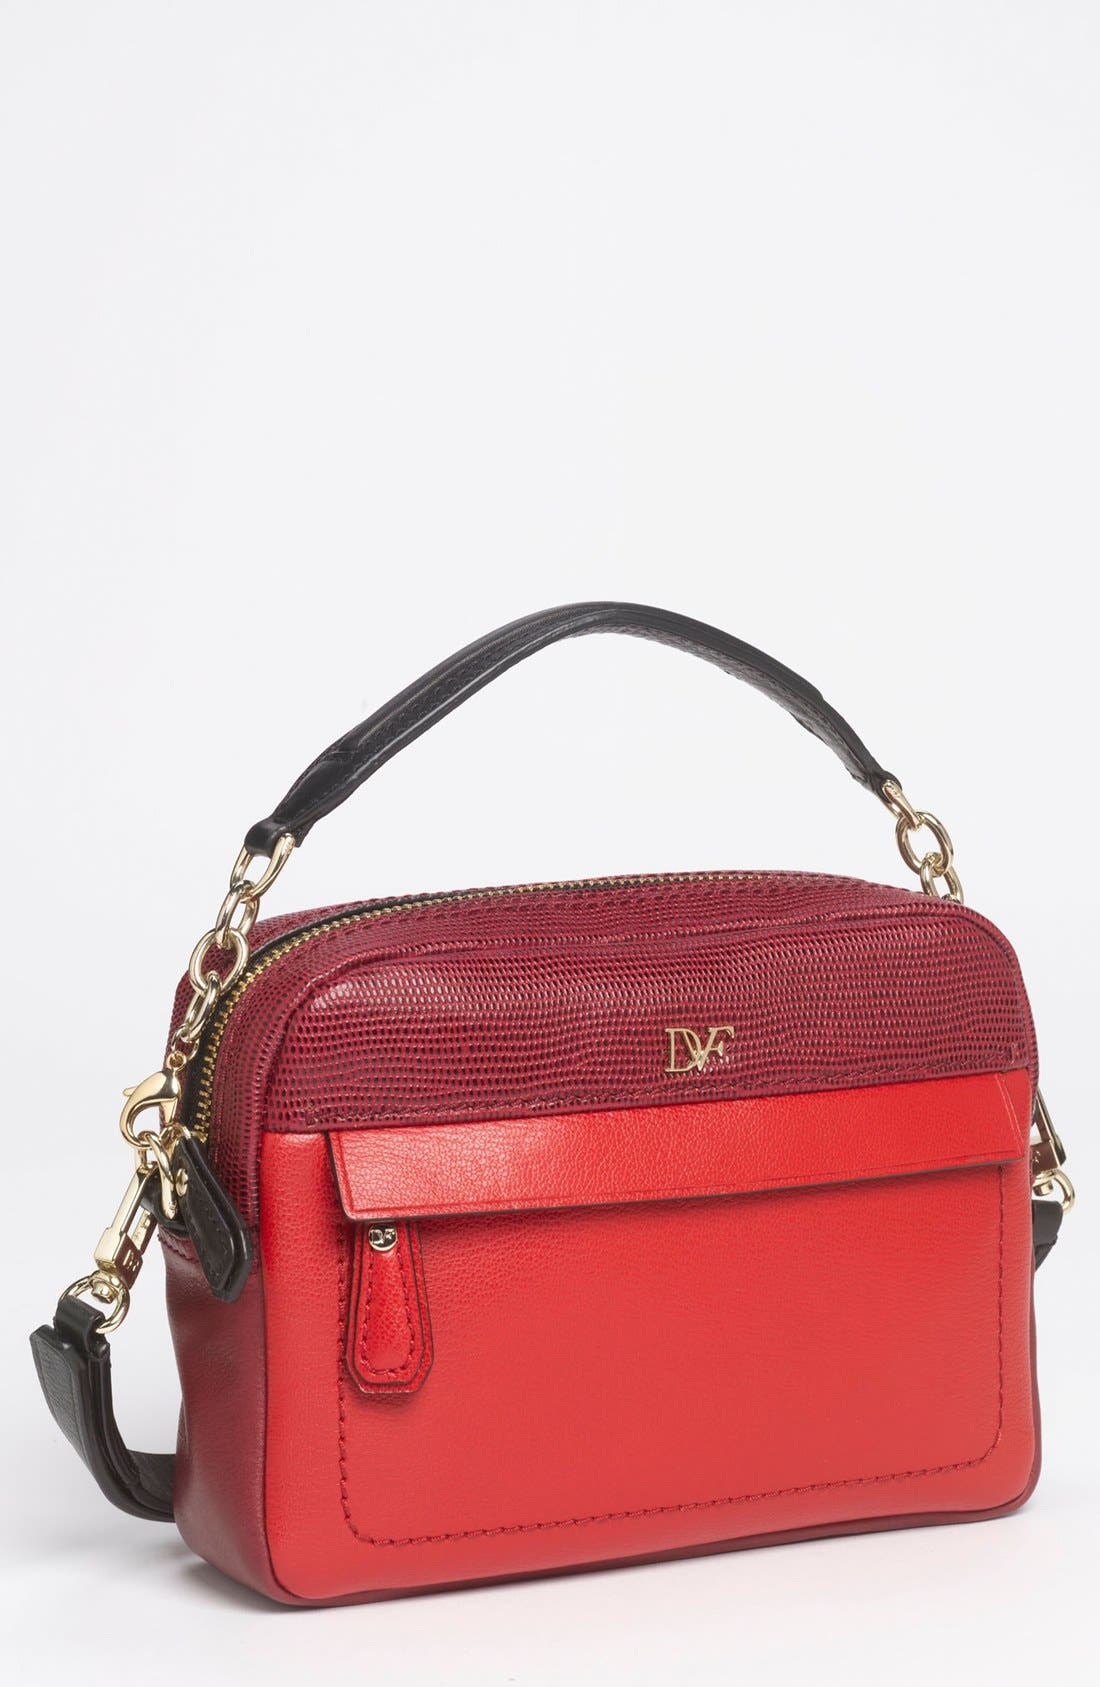 Main Image - Diane von Furstenberg 'Milo - Mini' Lizard Embossed Crossbody Bag (Online Only)